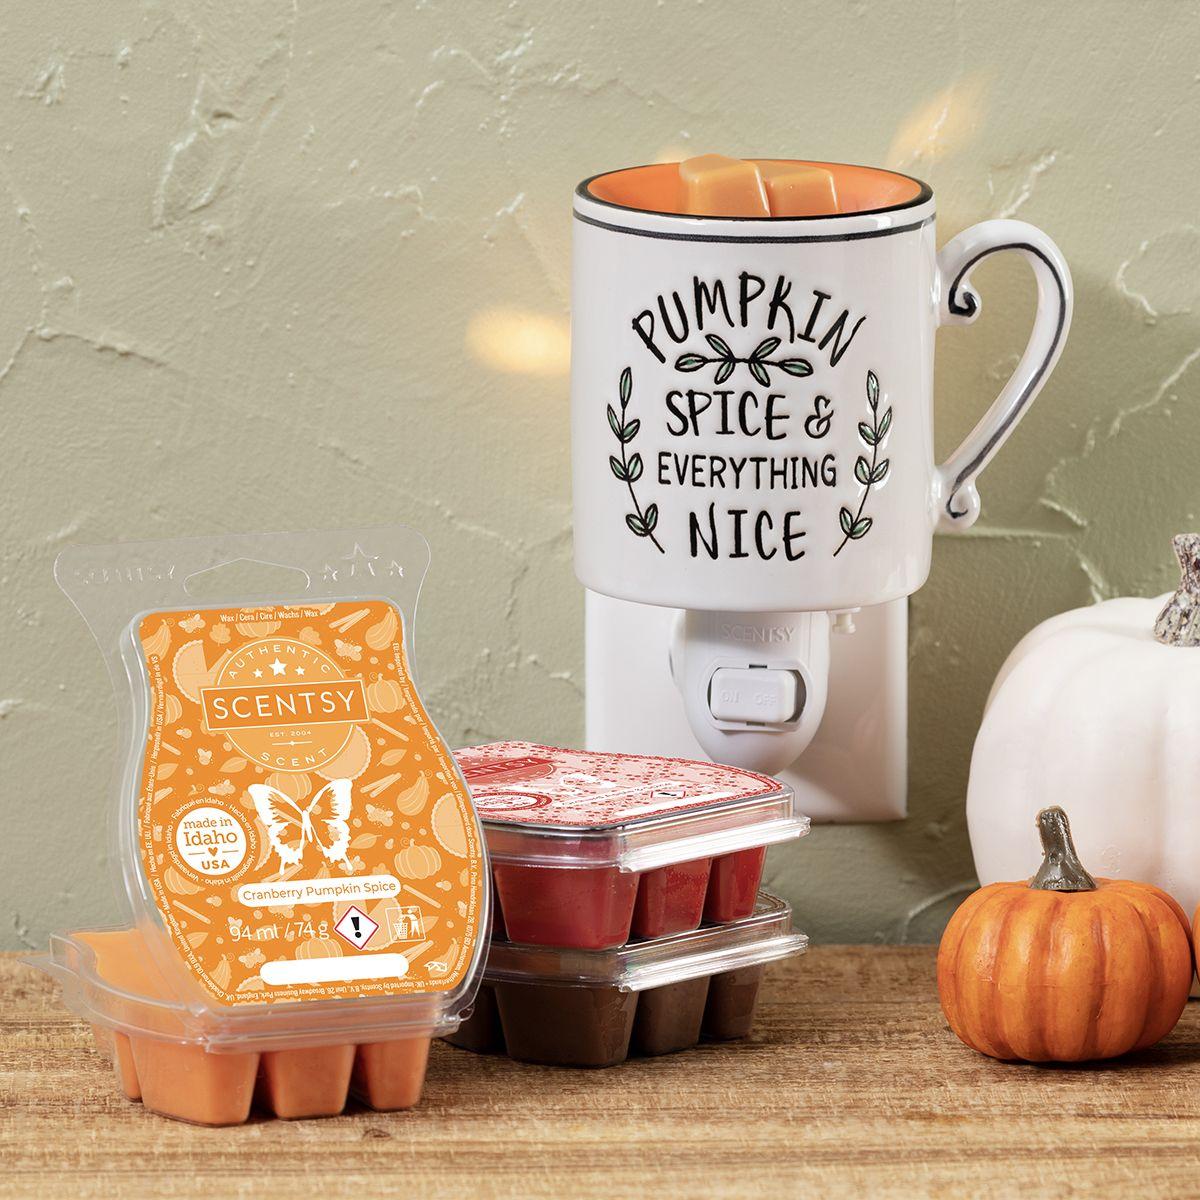 Pumpkin Spice & Everything Nice Scentsy Mini Warmer